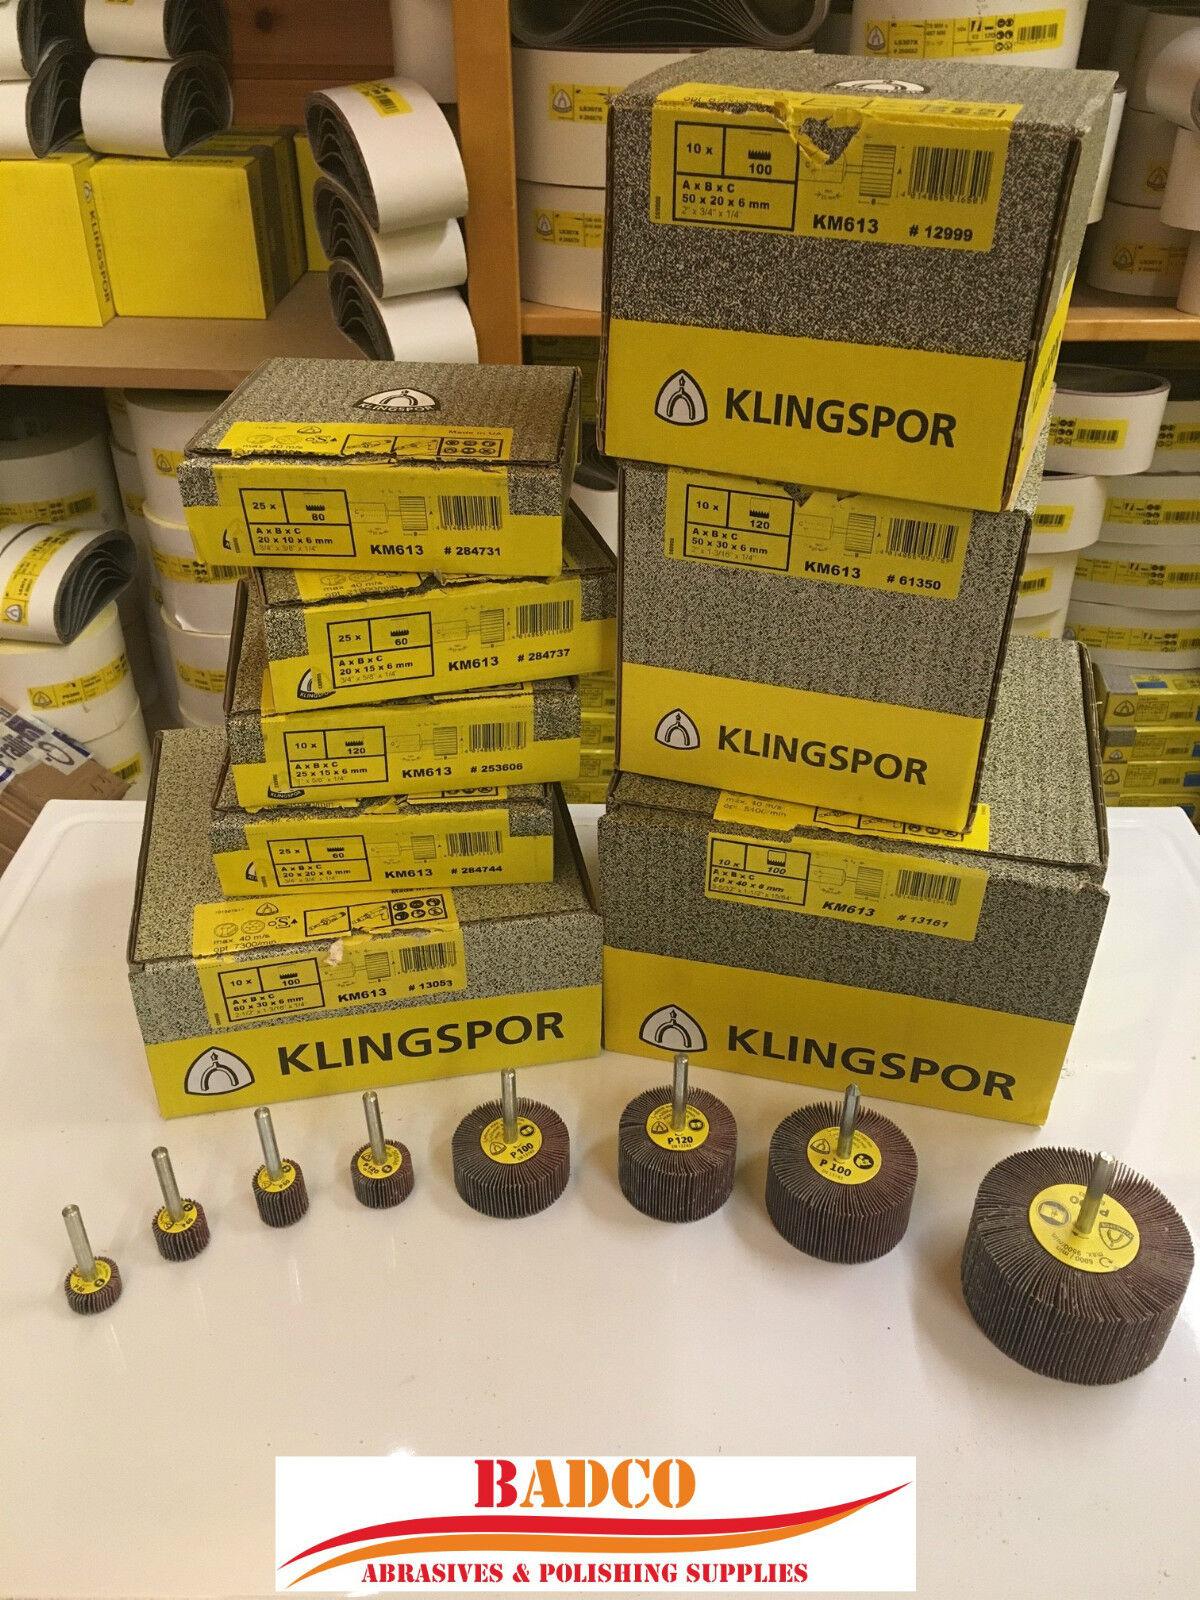 Sanding Abrasive Flap Wheel Mop KLINGSPOR KM613 Sandpaper Metal INOX Wood DIY